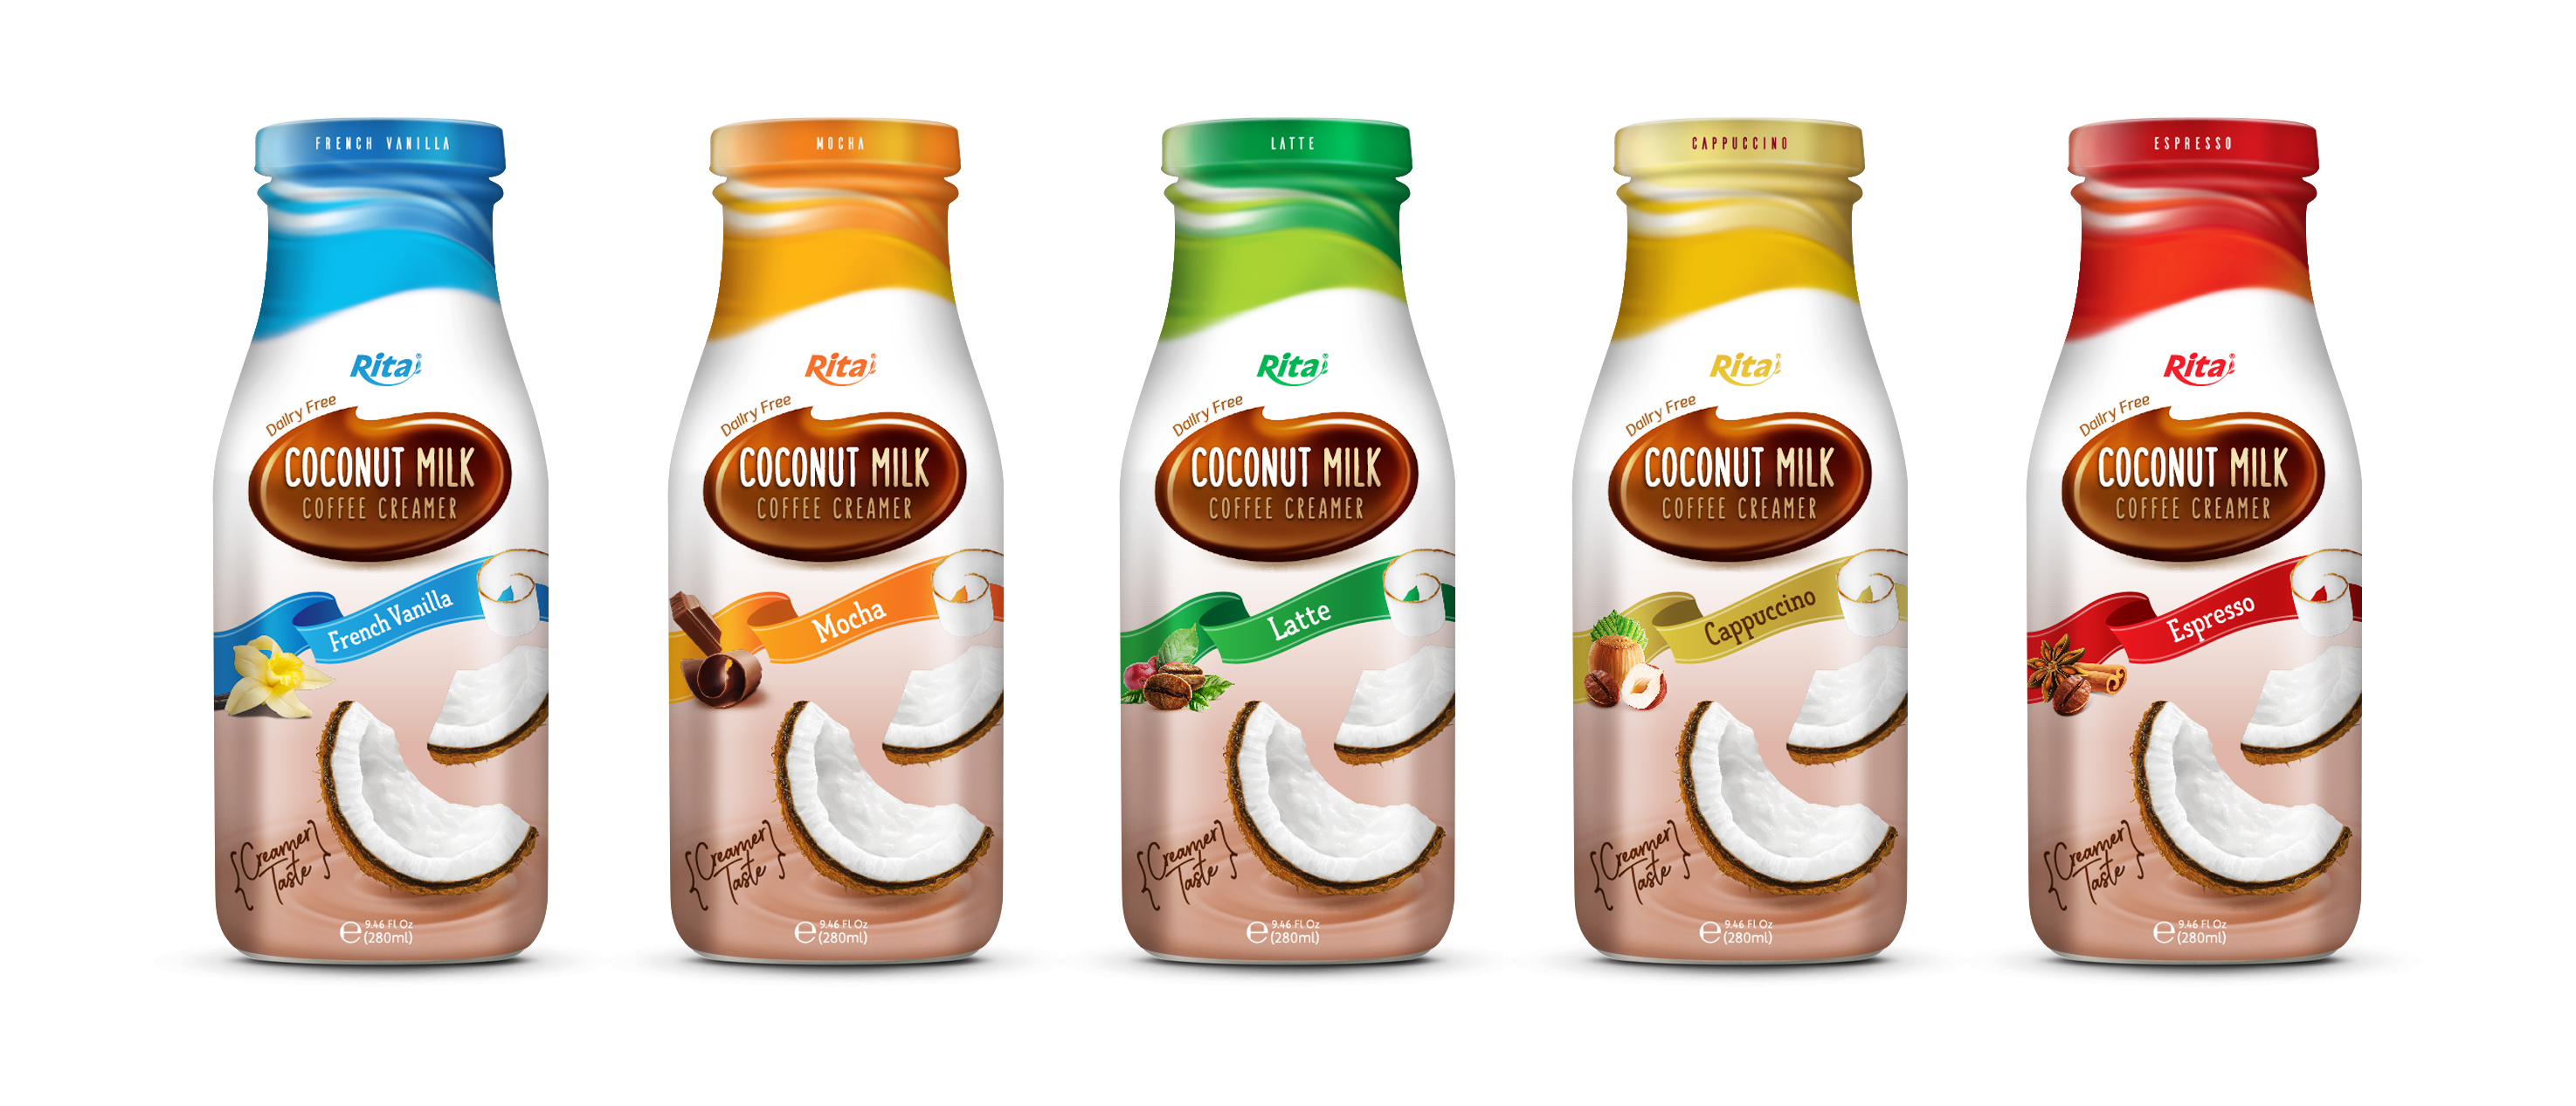 Wholesale Coconut milk Coffee Creamer280ml